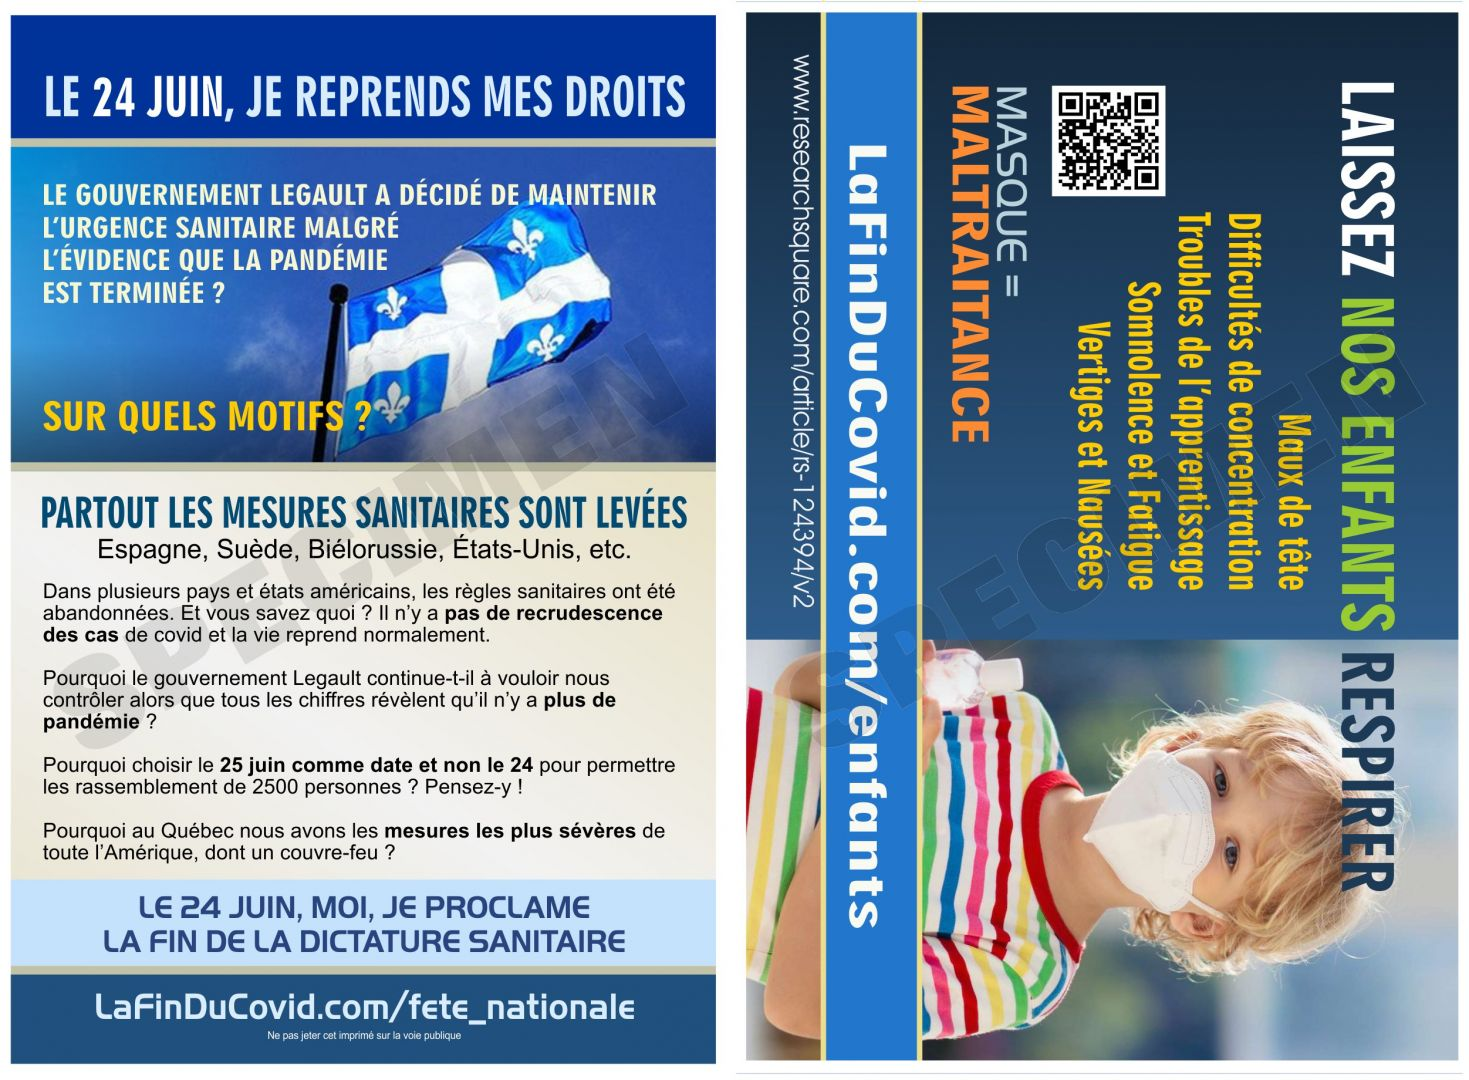 Cartes Postales (4x6) - (24 juin - Masque enfants)